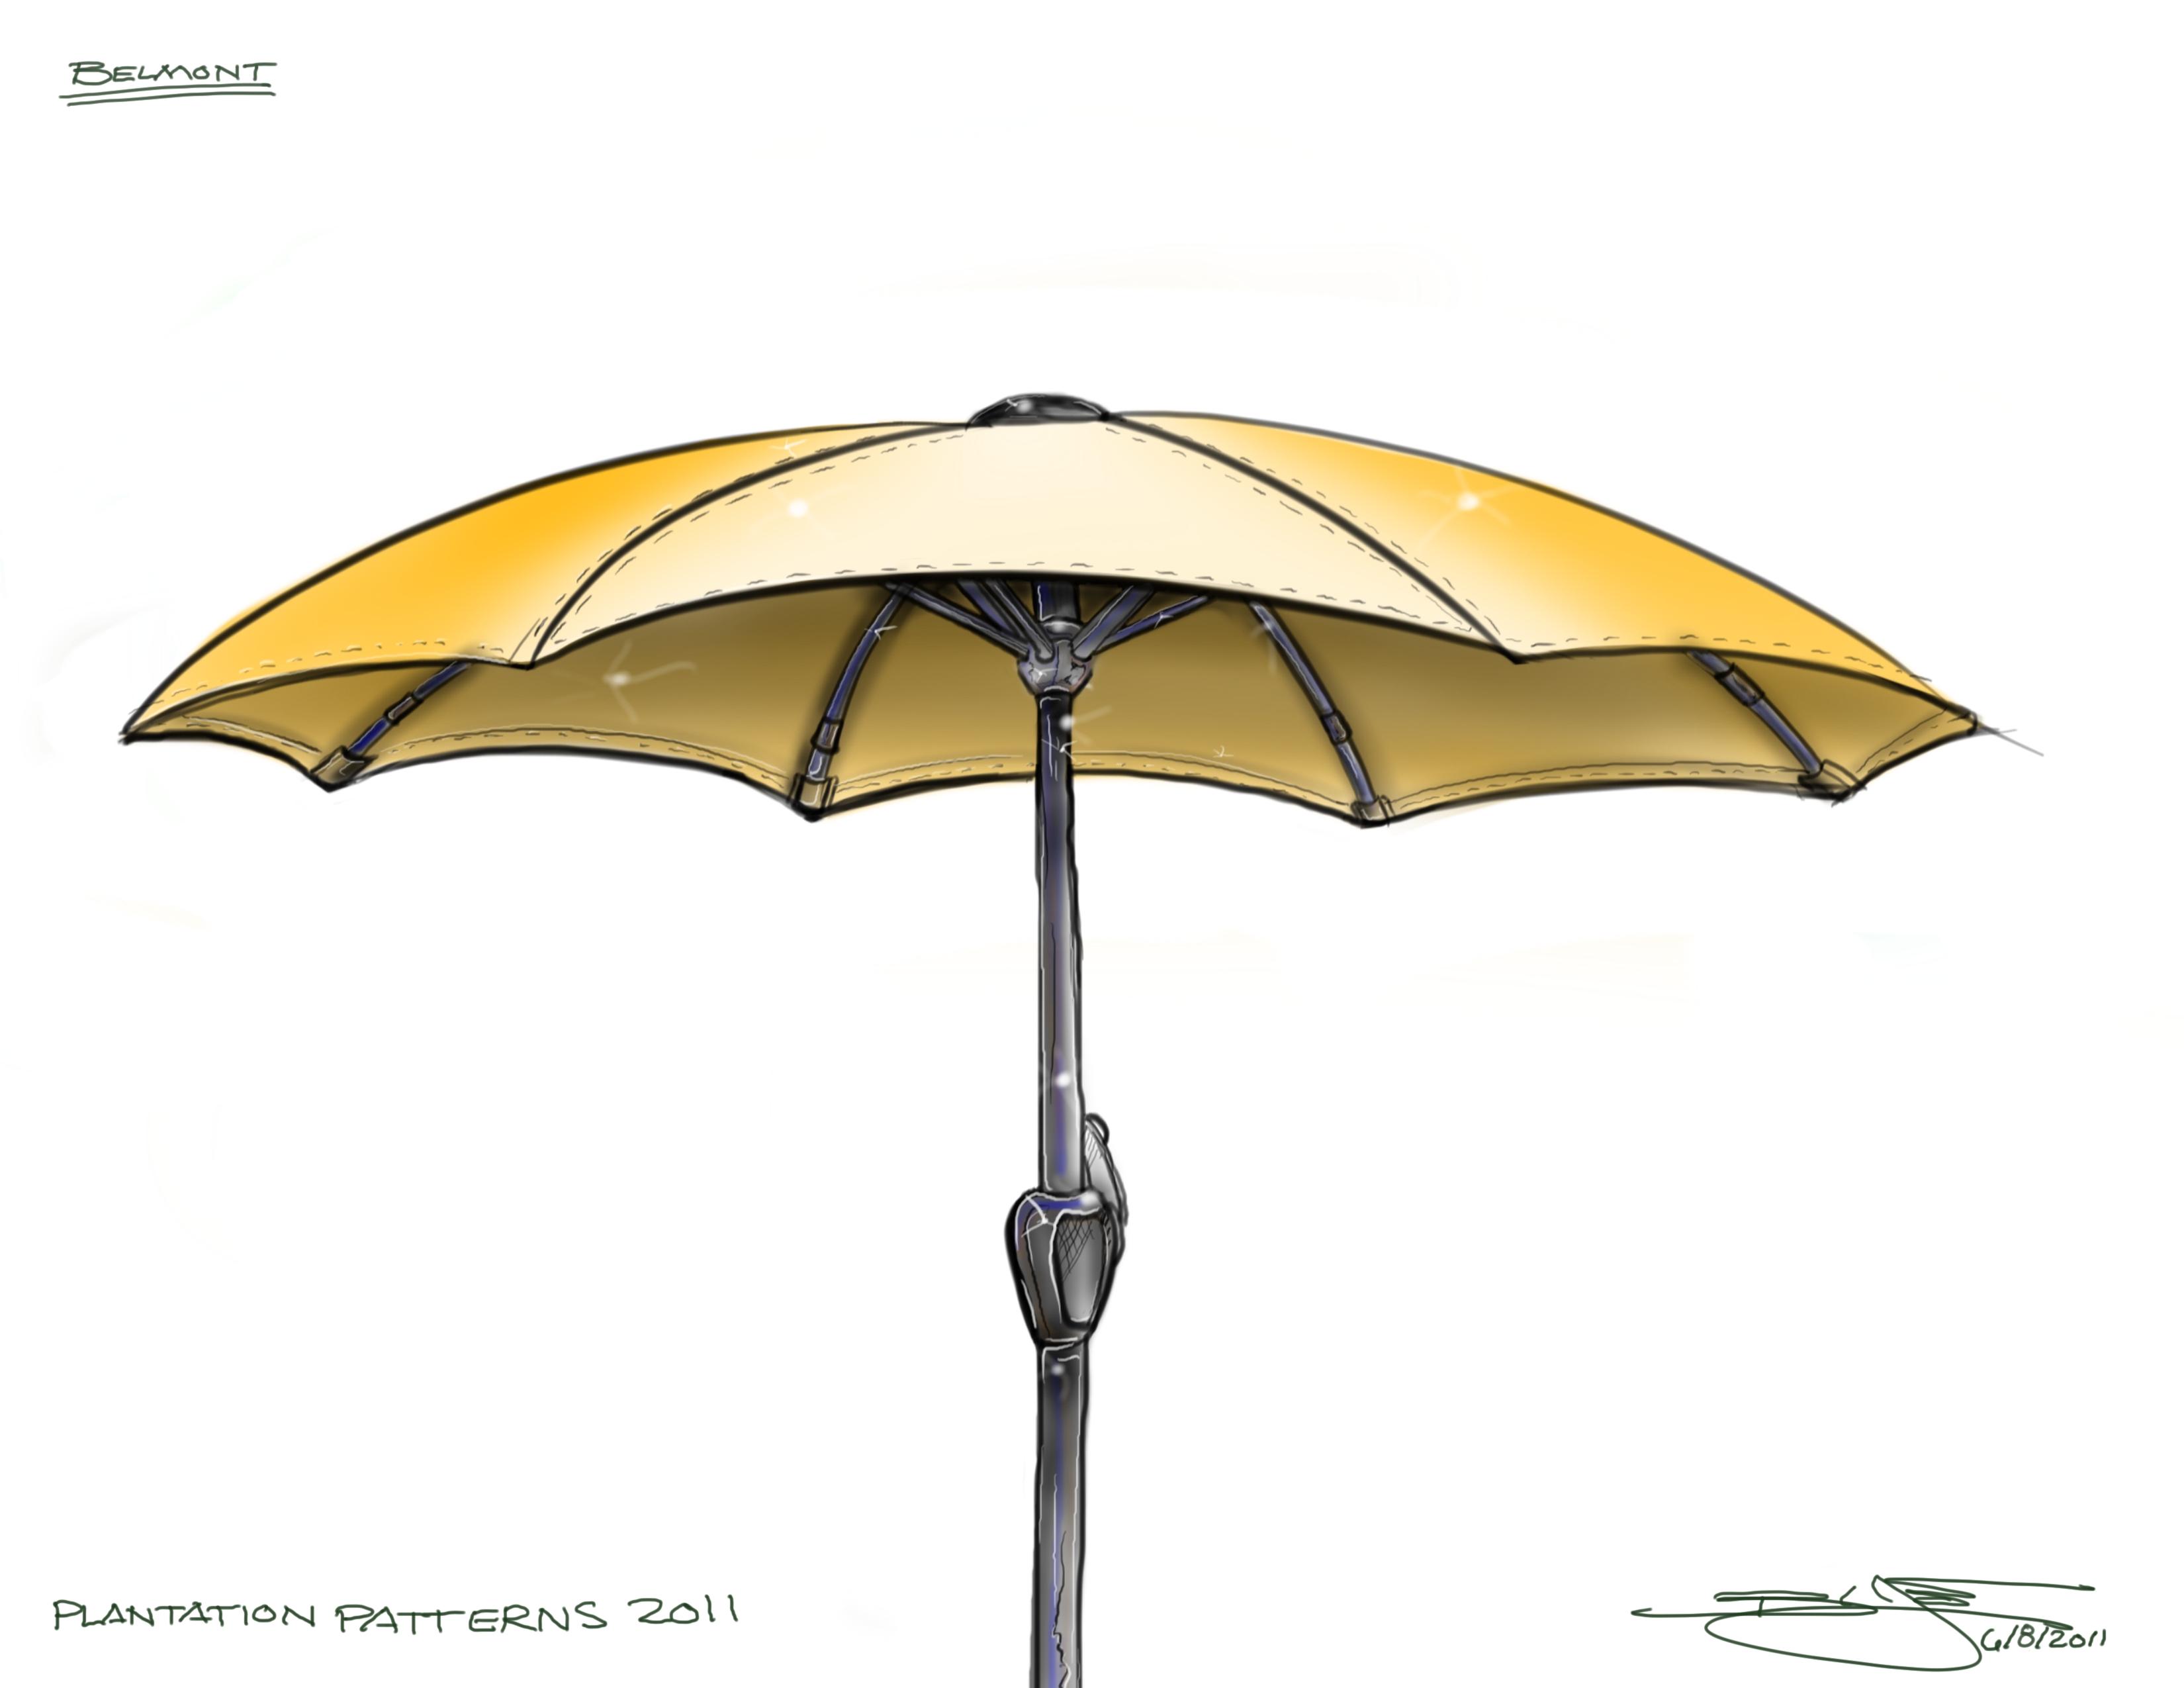 sketchbook pro by brian love at coroflotcom - modern umbrella sketch  sketchbook pro rendering of a modern umbrelladesign